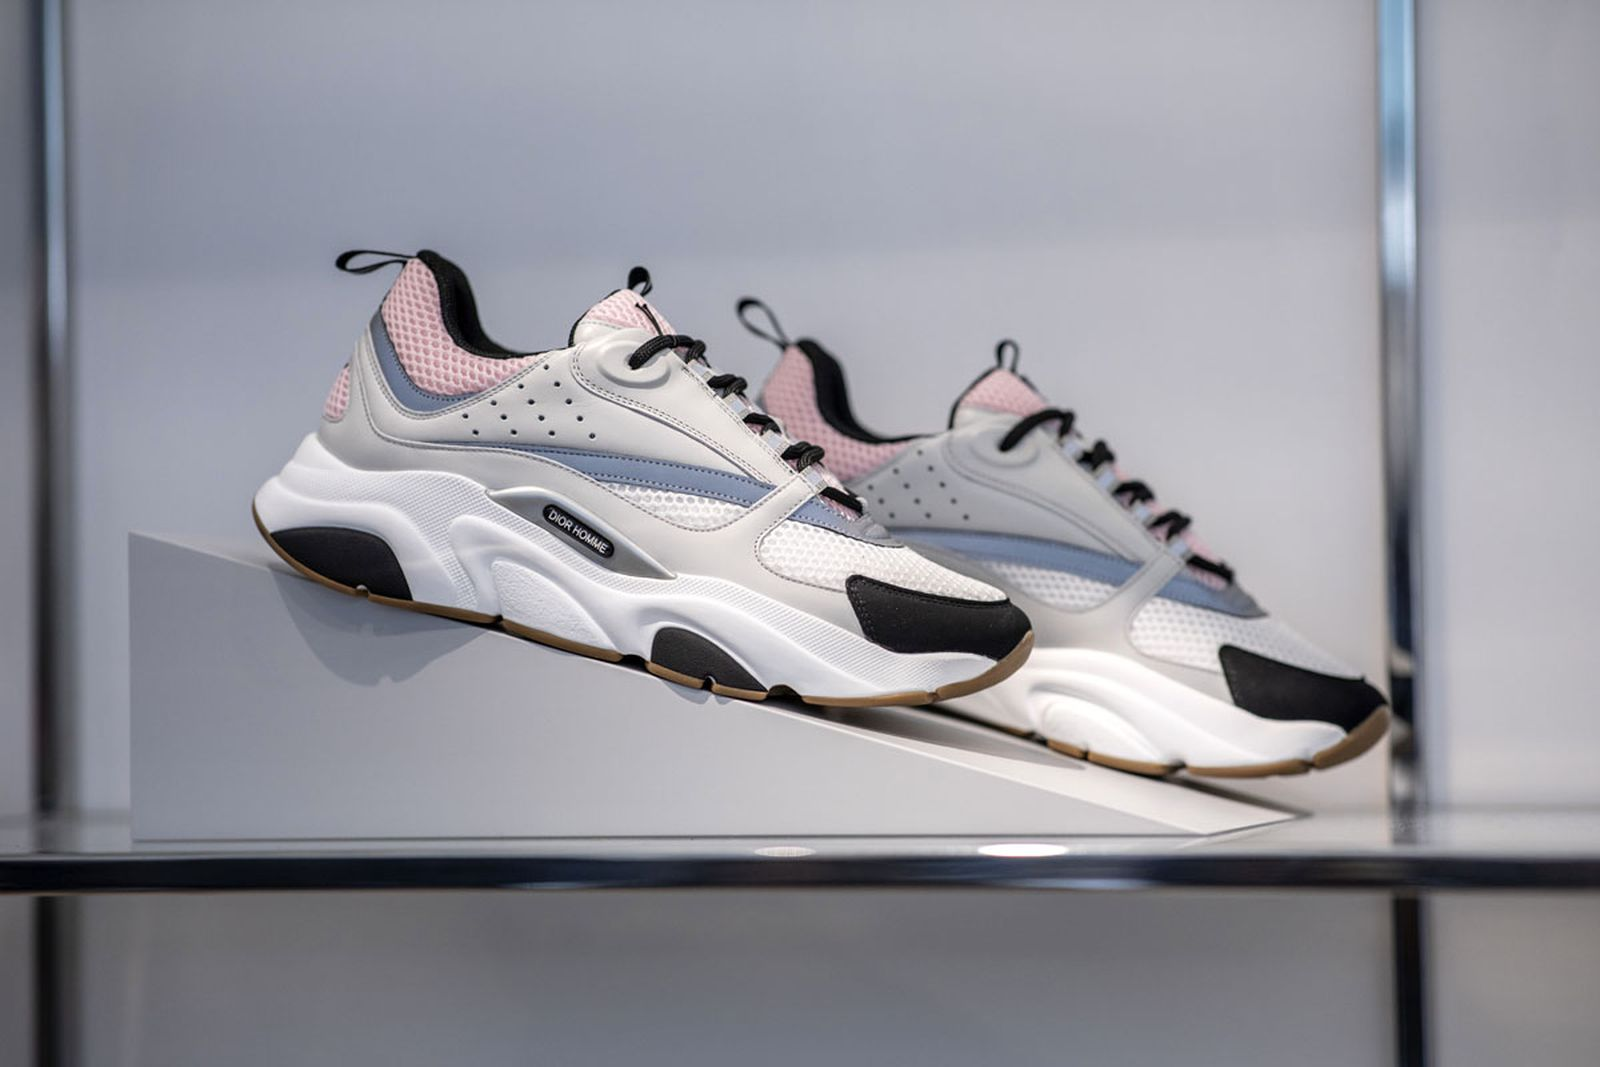 dior ss19 sneakers1 kim jones